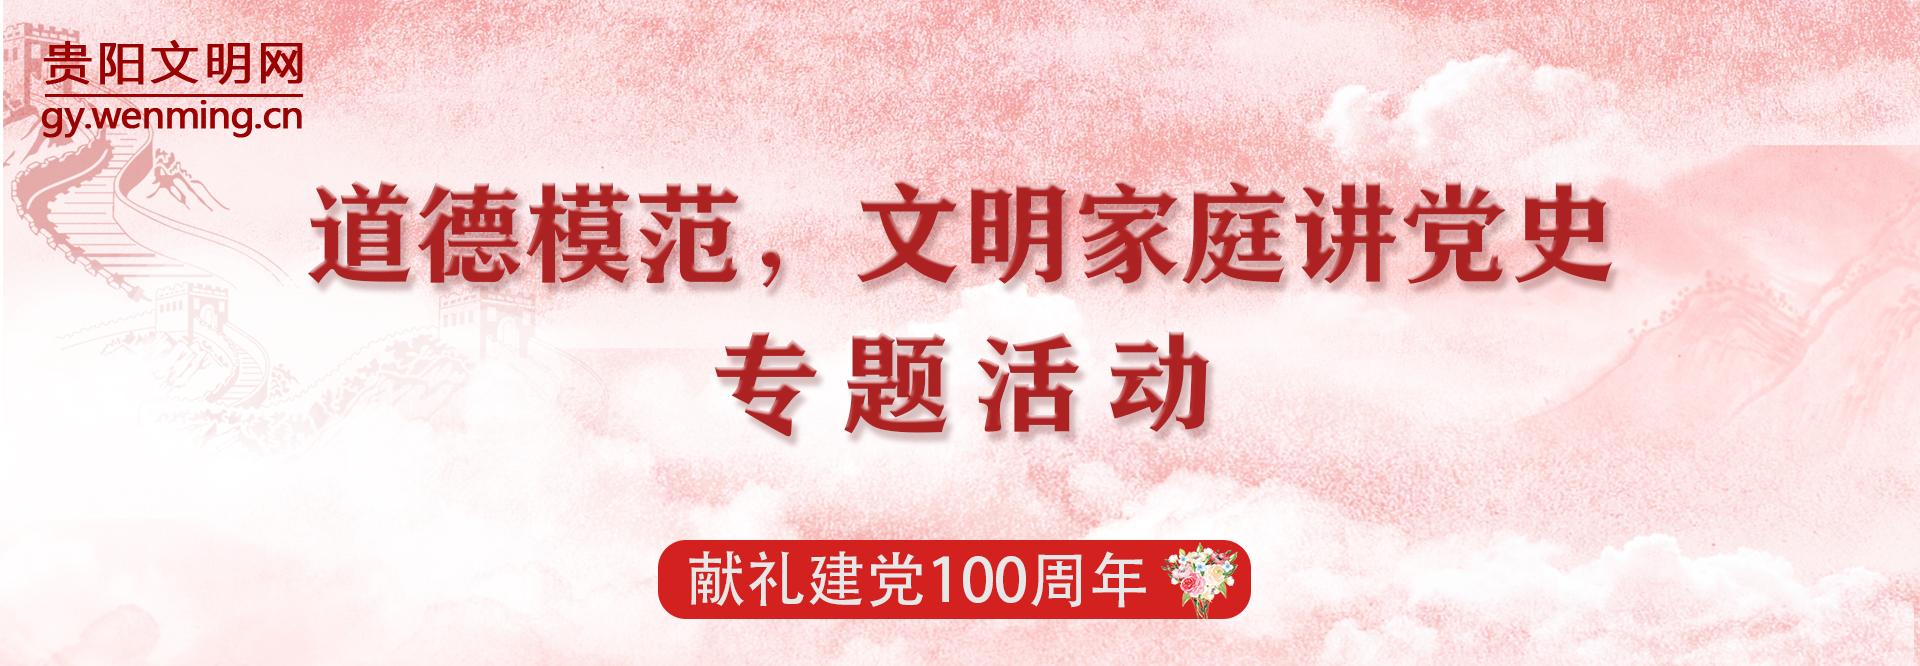 視屏展(zhan)示.jpg